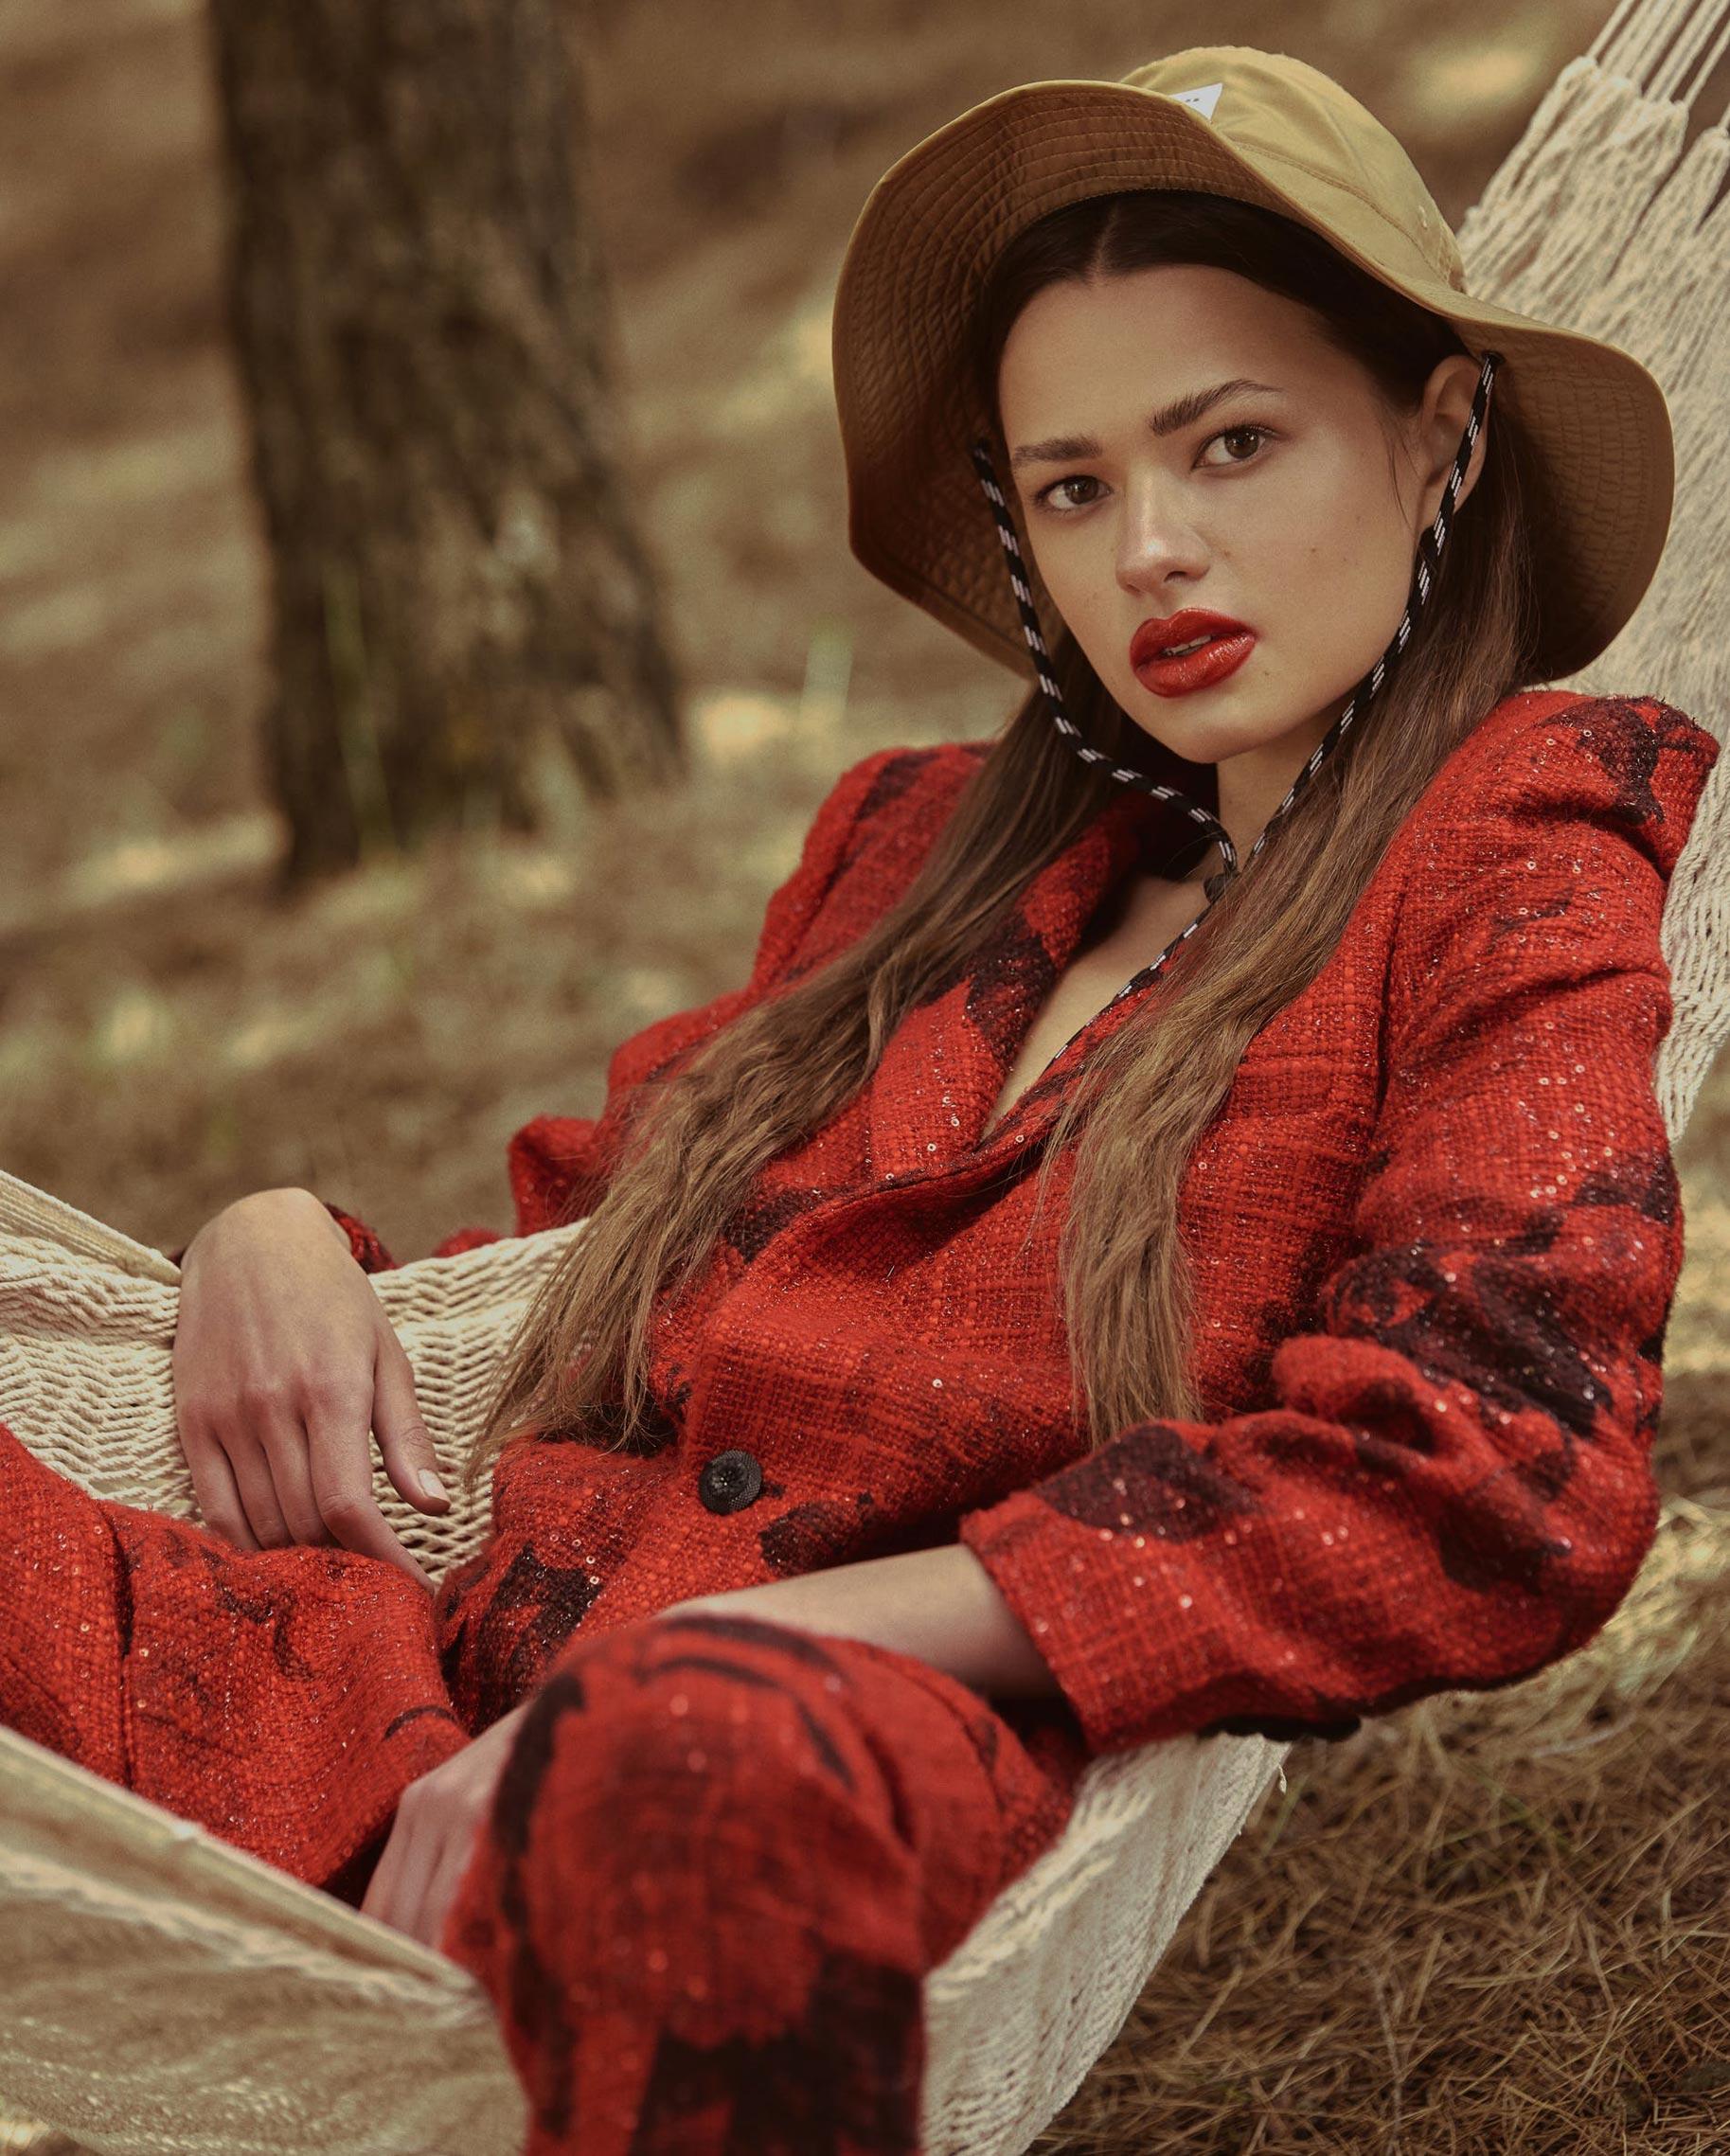 Диана Свиридова в лесу демонстрирует винтажную технику и новинки моды / фото 12